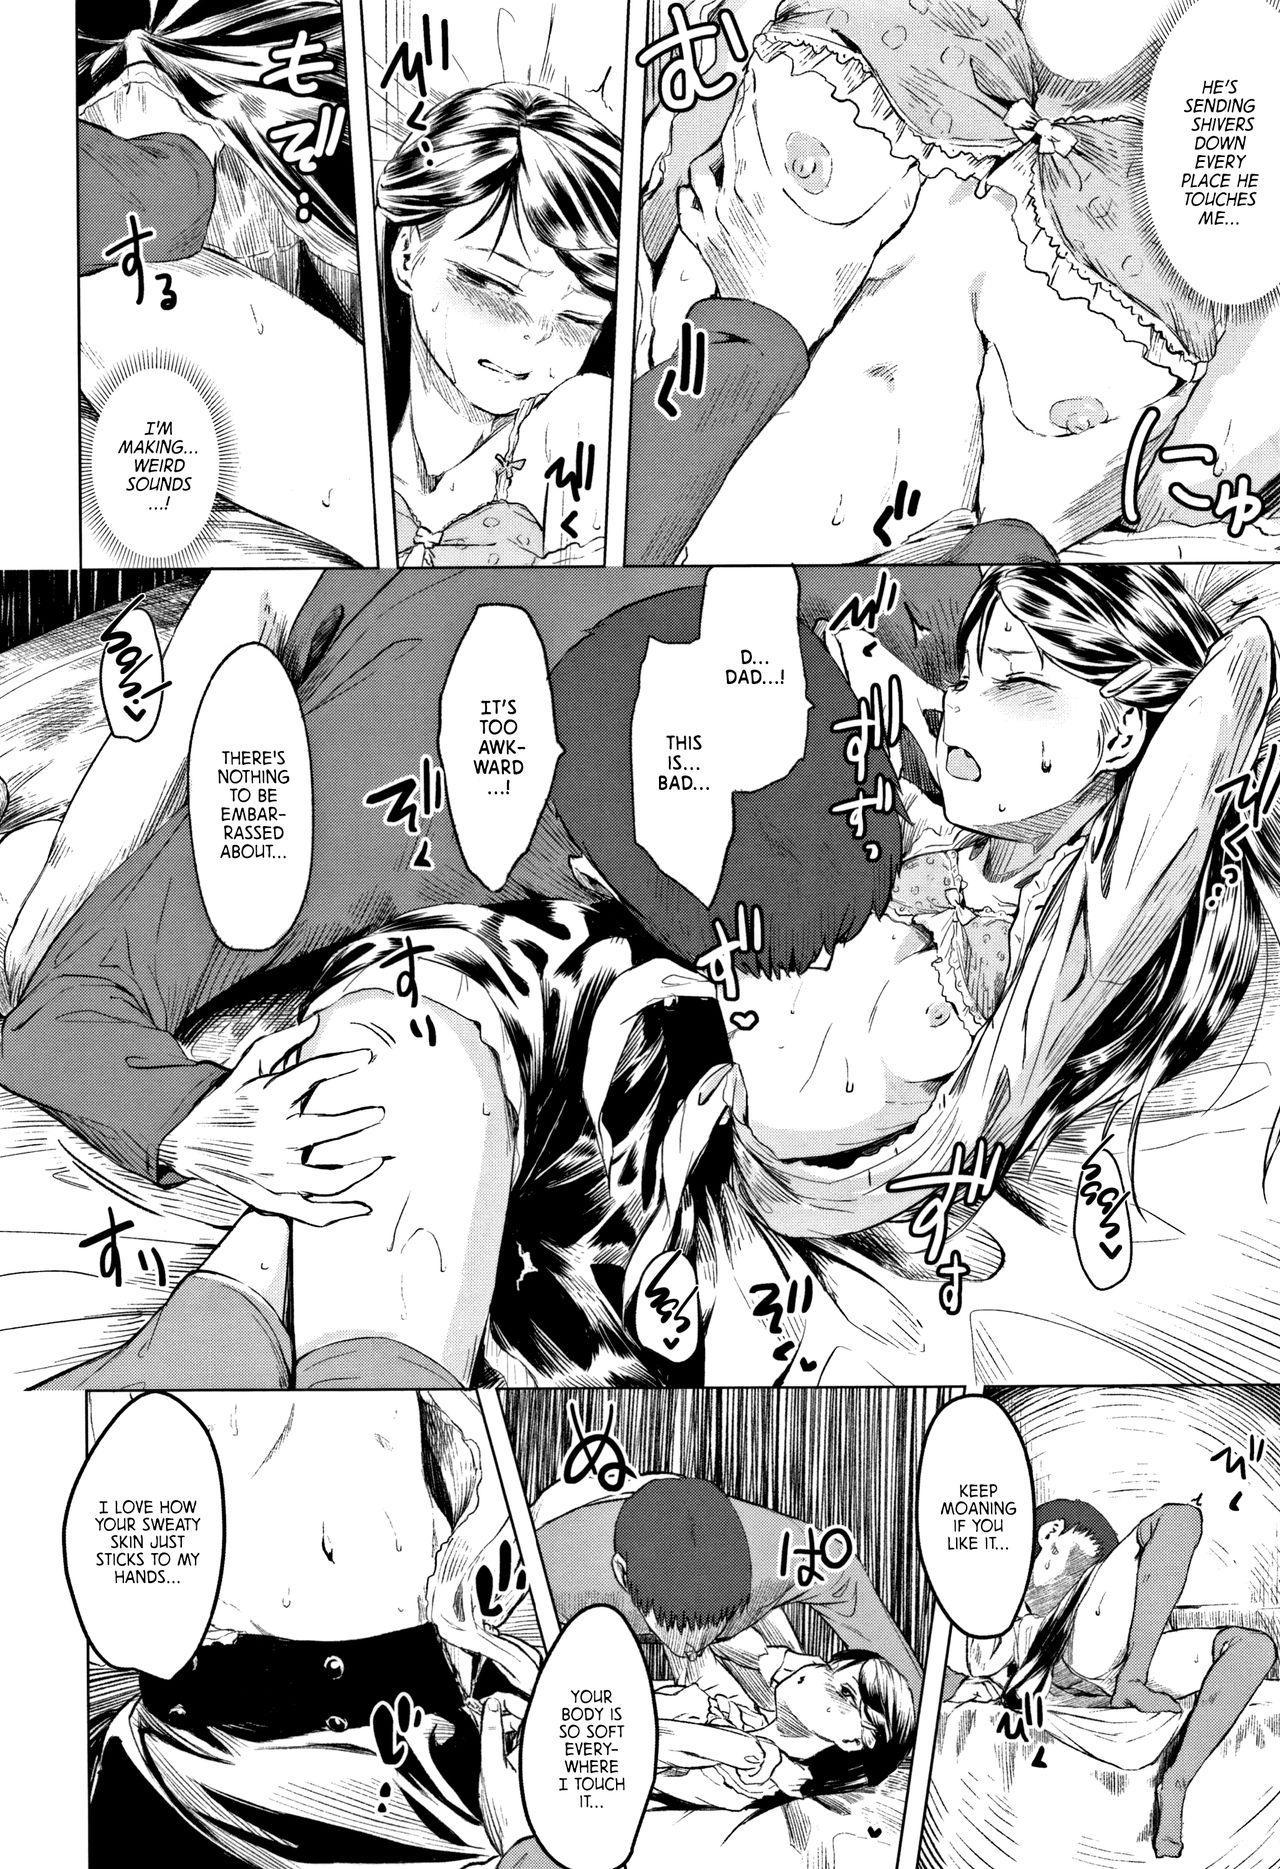 Chichi to Musume no Seiai Hakusho | Father and daughter sex white paper 199